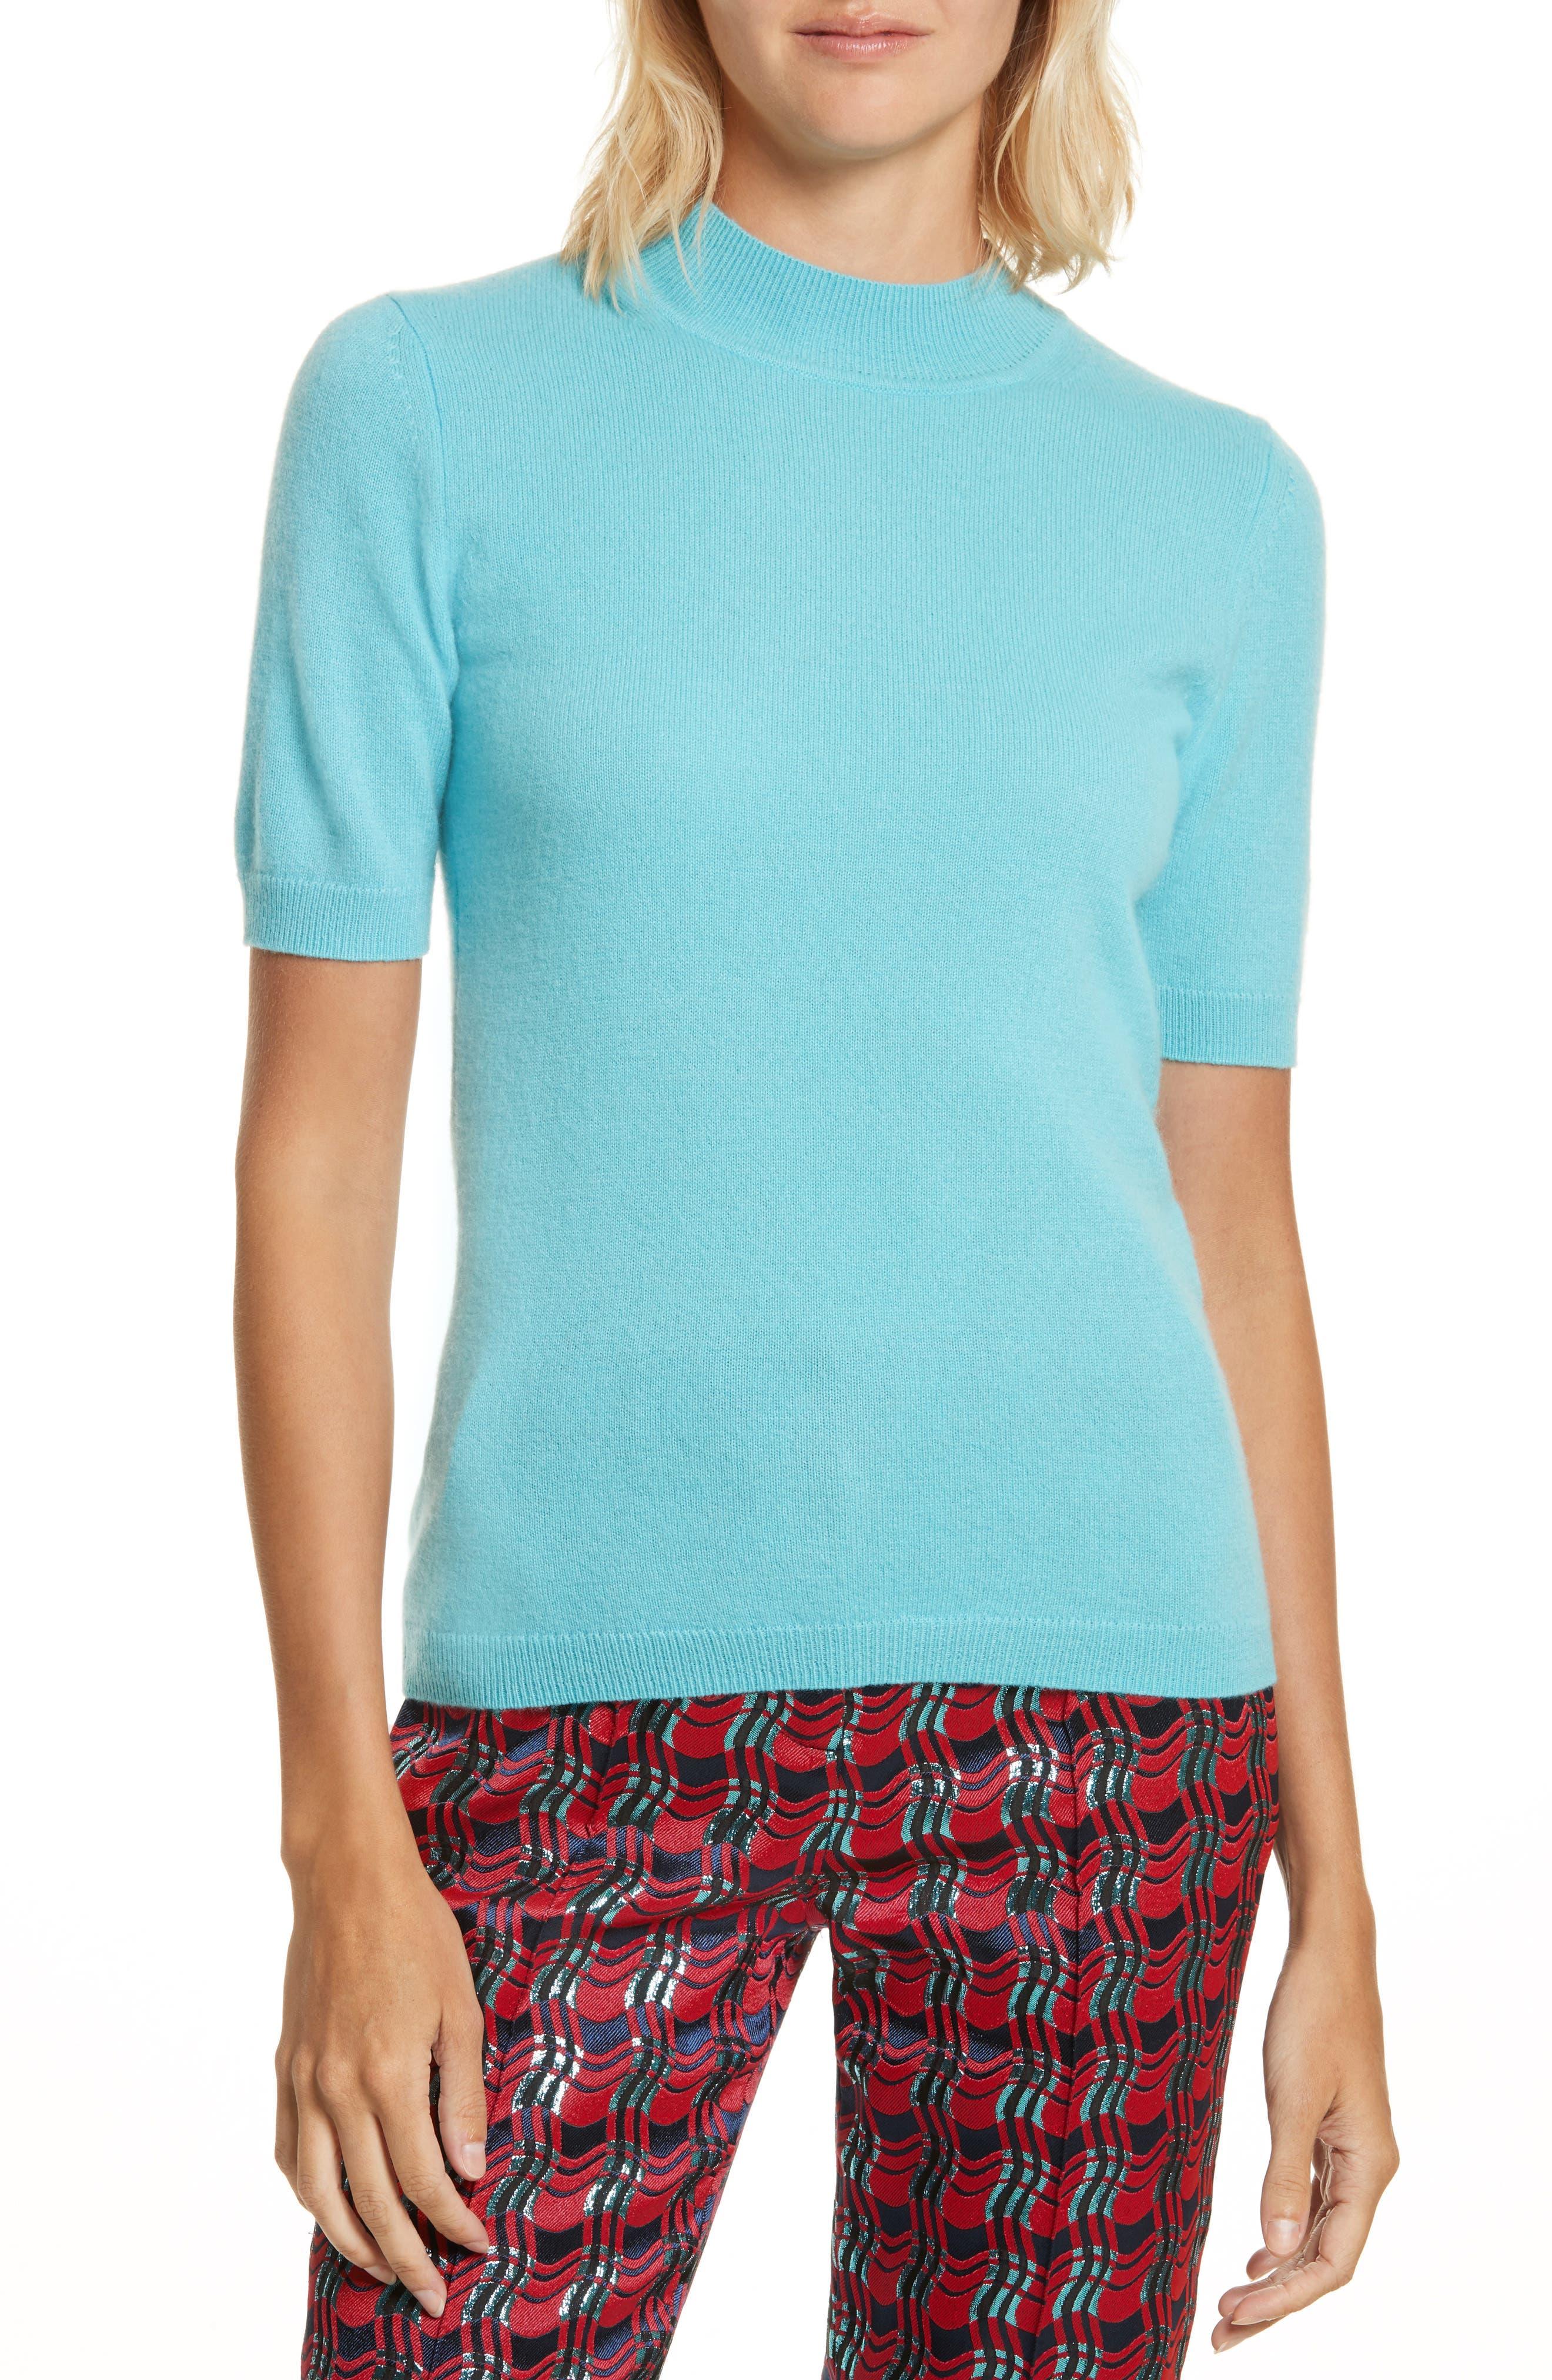 Alternate Image 1 Selected - Diane von Furstenberg Mock Neck Cashmere Sweater